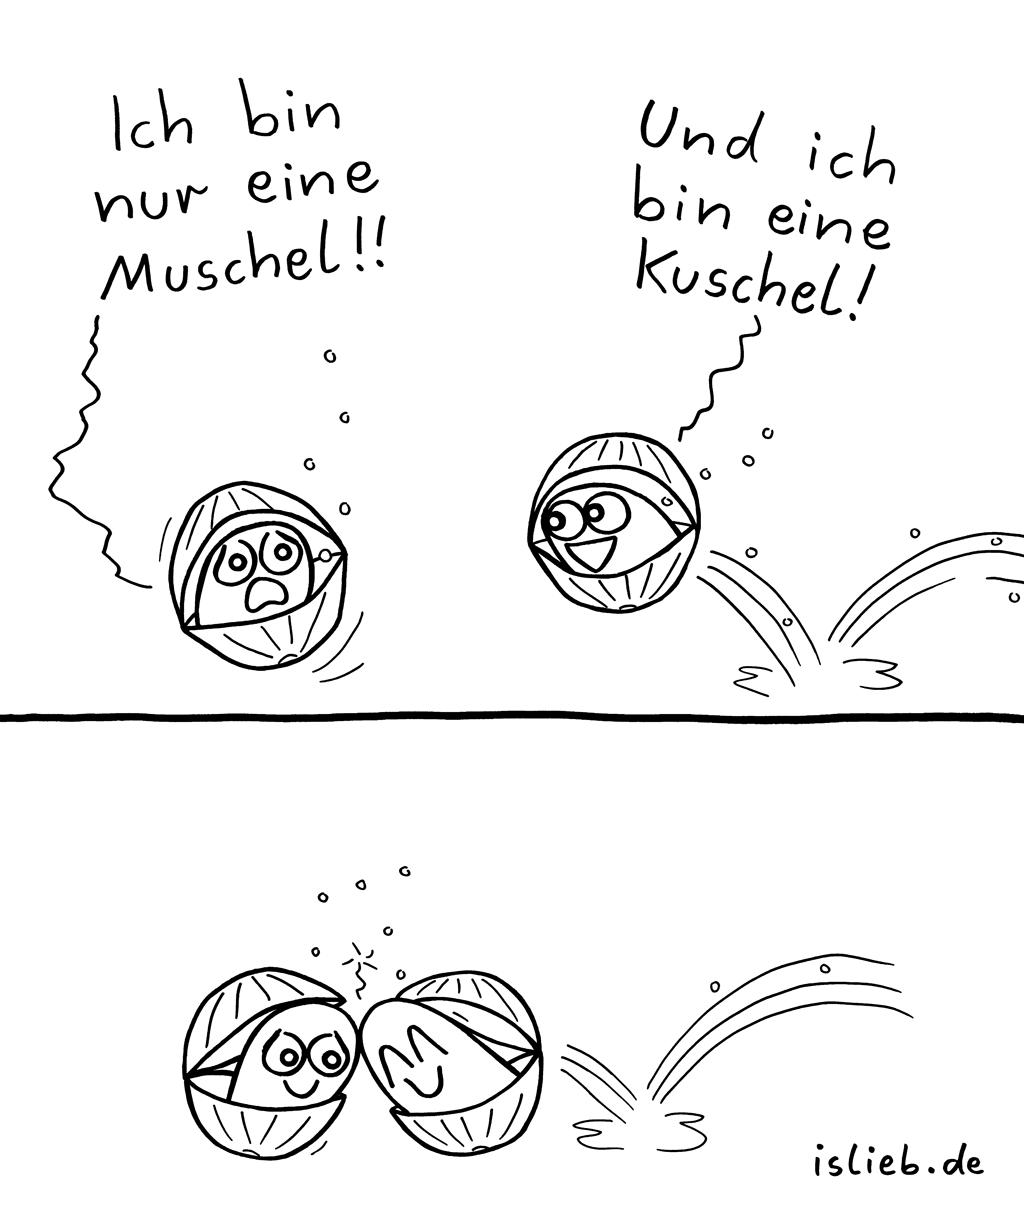 Muschel mit Comic Muschel